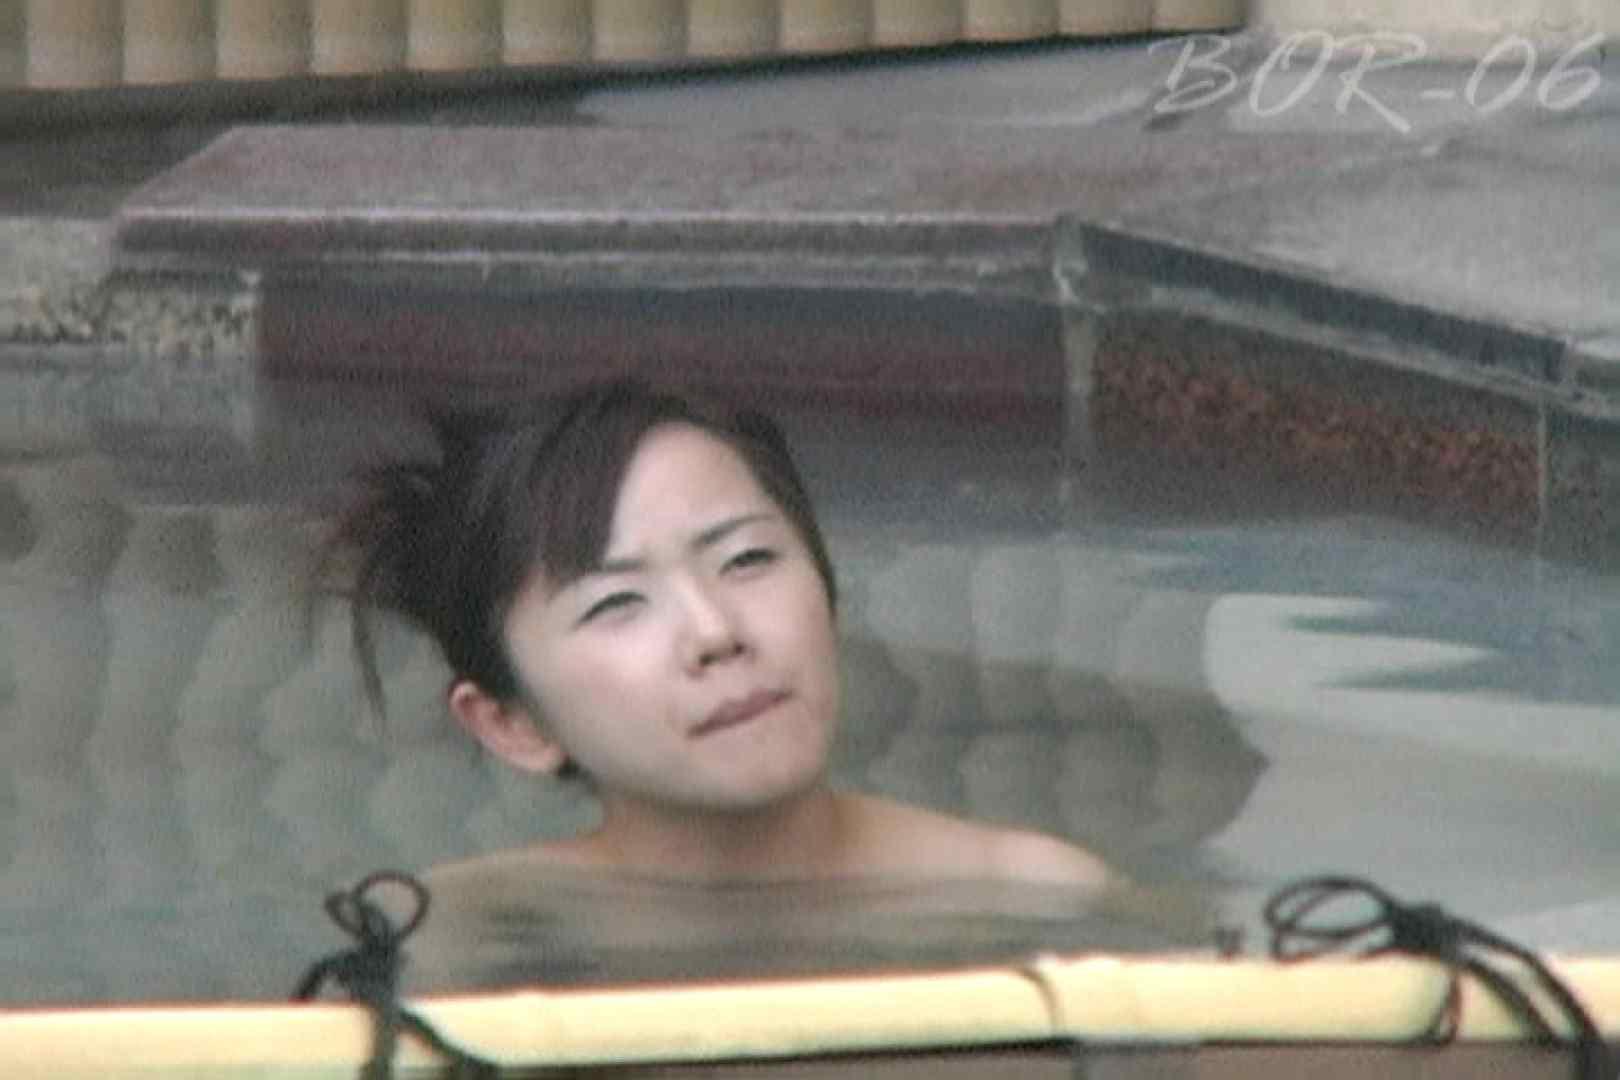 Aquaな露天風呂Vol.521 OLセックス  92画像 54